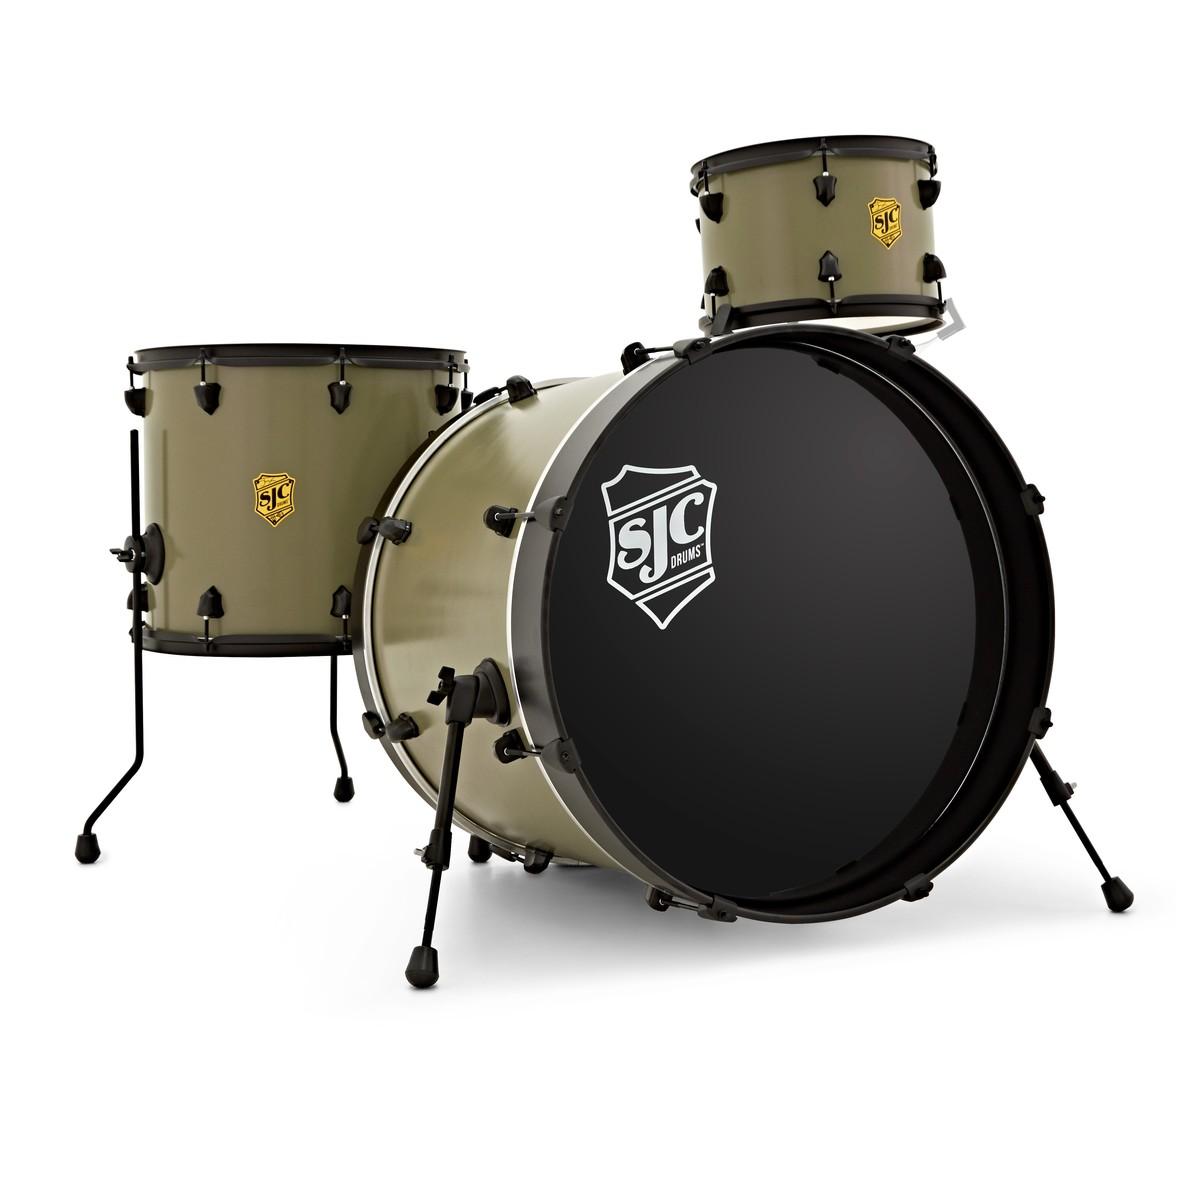 SJC Drums Josh Dun Bandito 22'' 3pc Shell Pack, Trench Olive, Black HW